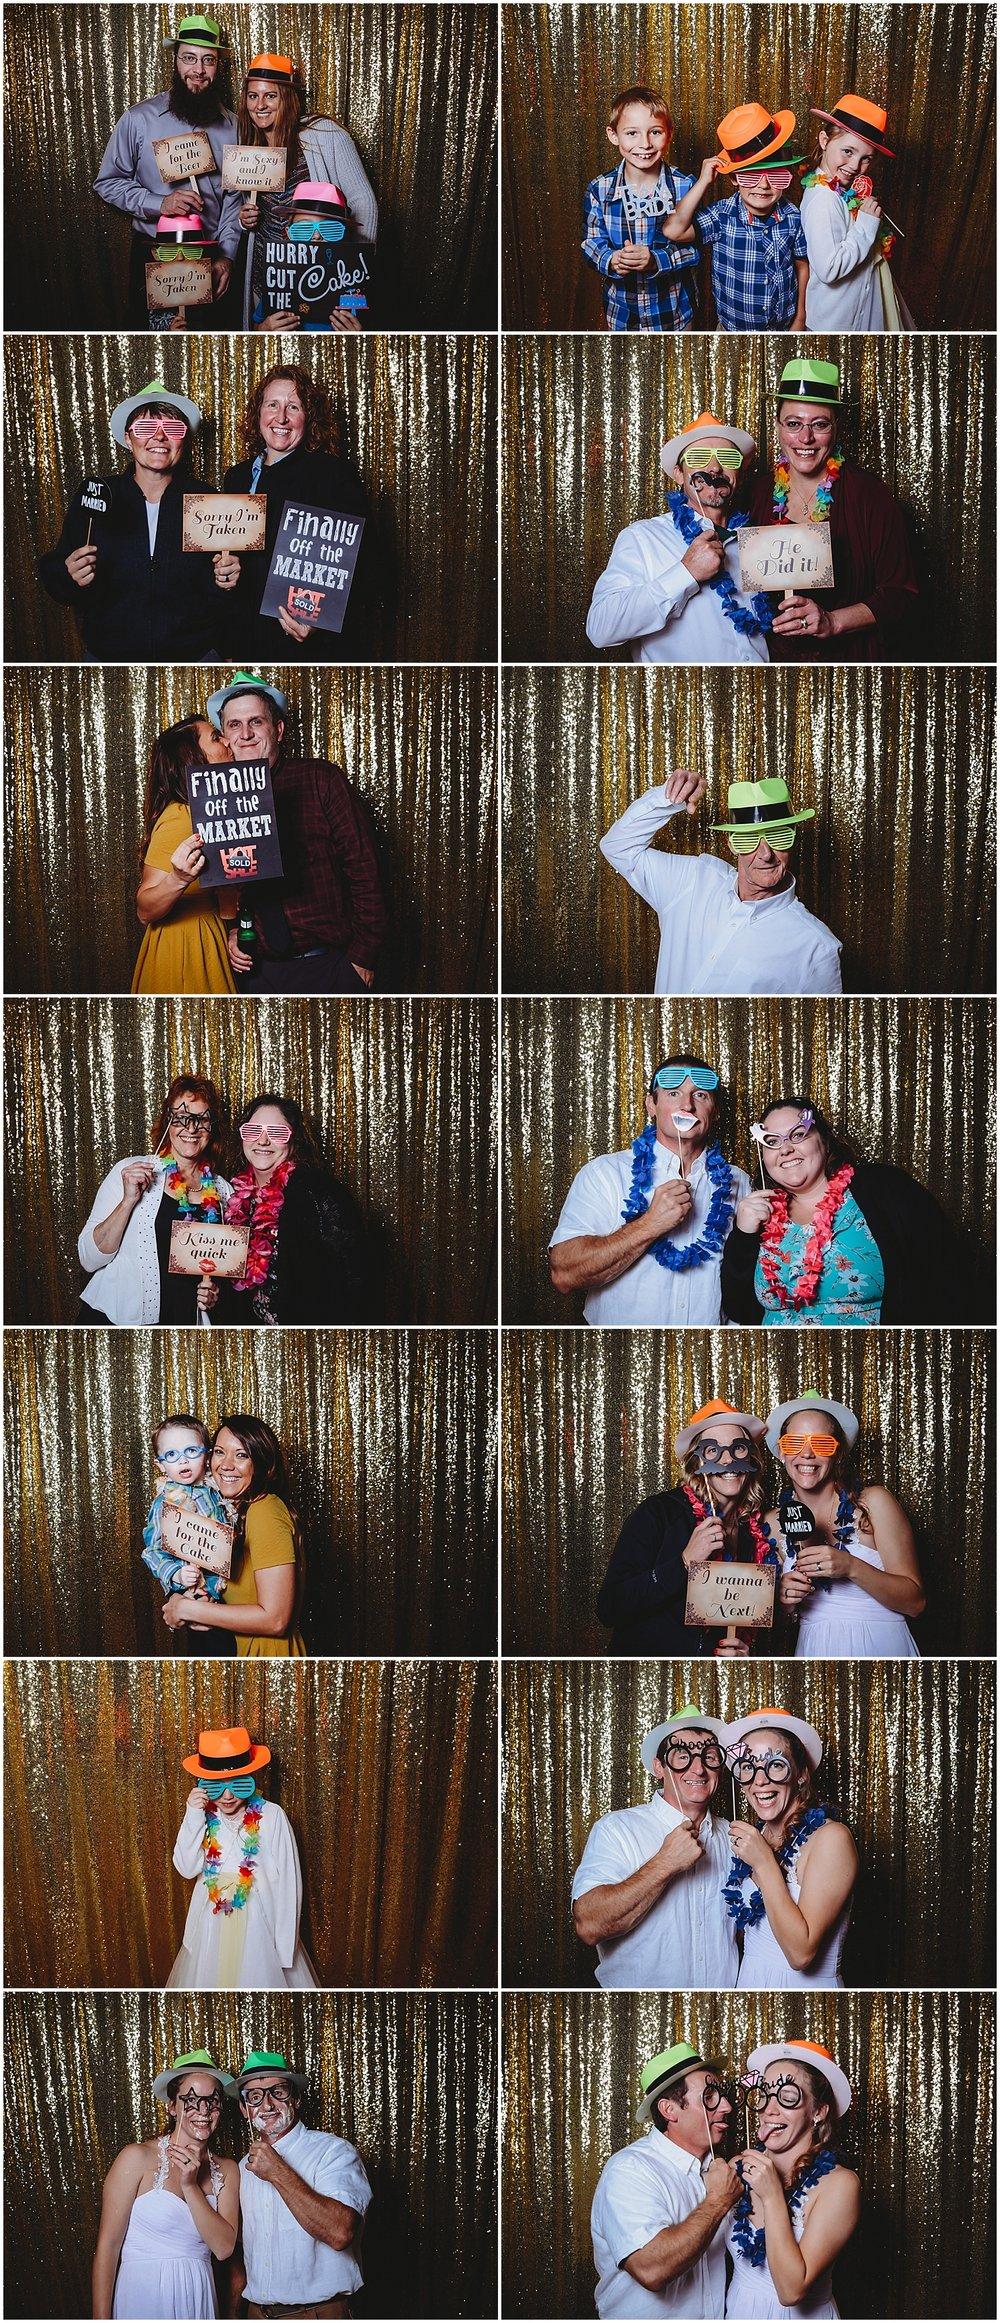 NEPA-Scranton-Dallas-wedding-engagement-photographer-in-Philadelphia-PA-Central-PA_0102.jpg